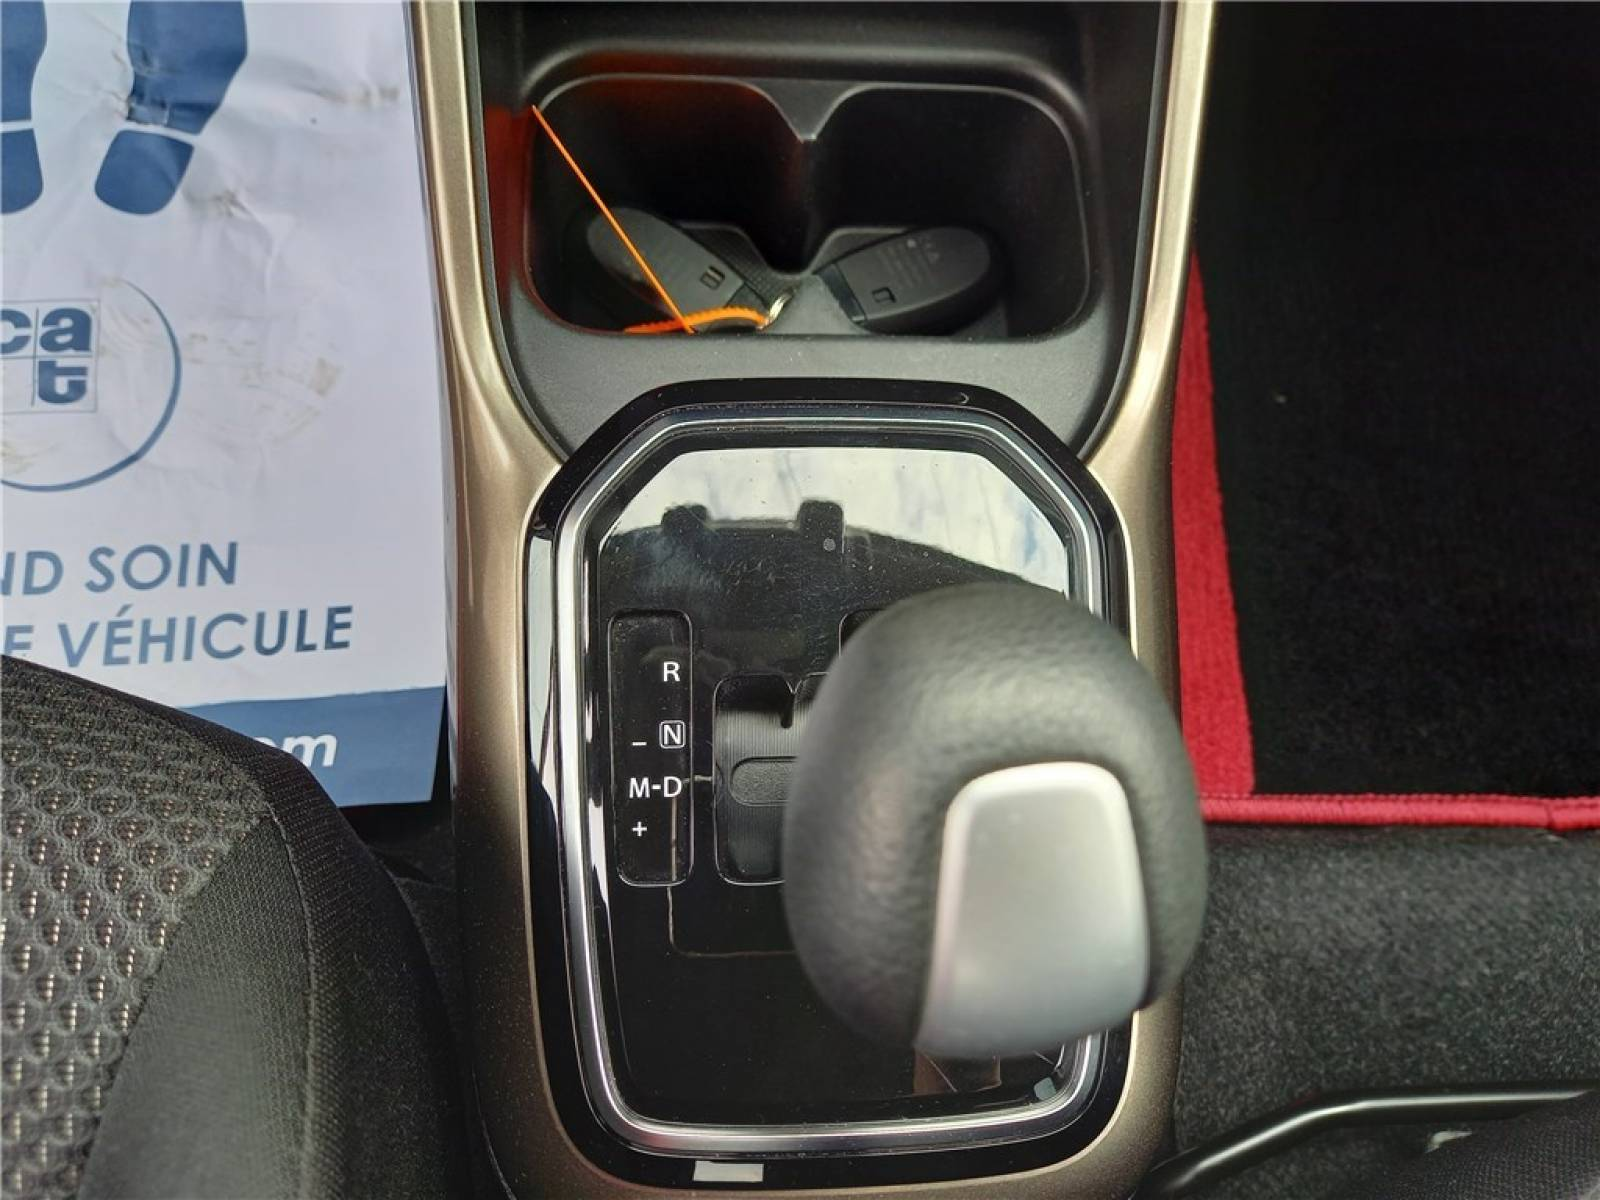 SUZUKI Ignis 1.2 Dualjet Auto (AGS) - véhicule d'occasion - Groupe Guillet - Opel Magicauto - Chalon-sur-Saône - 71380 - Saint-Marcel - 33